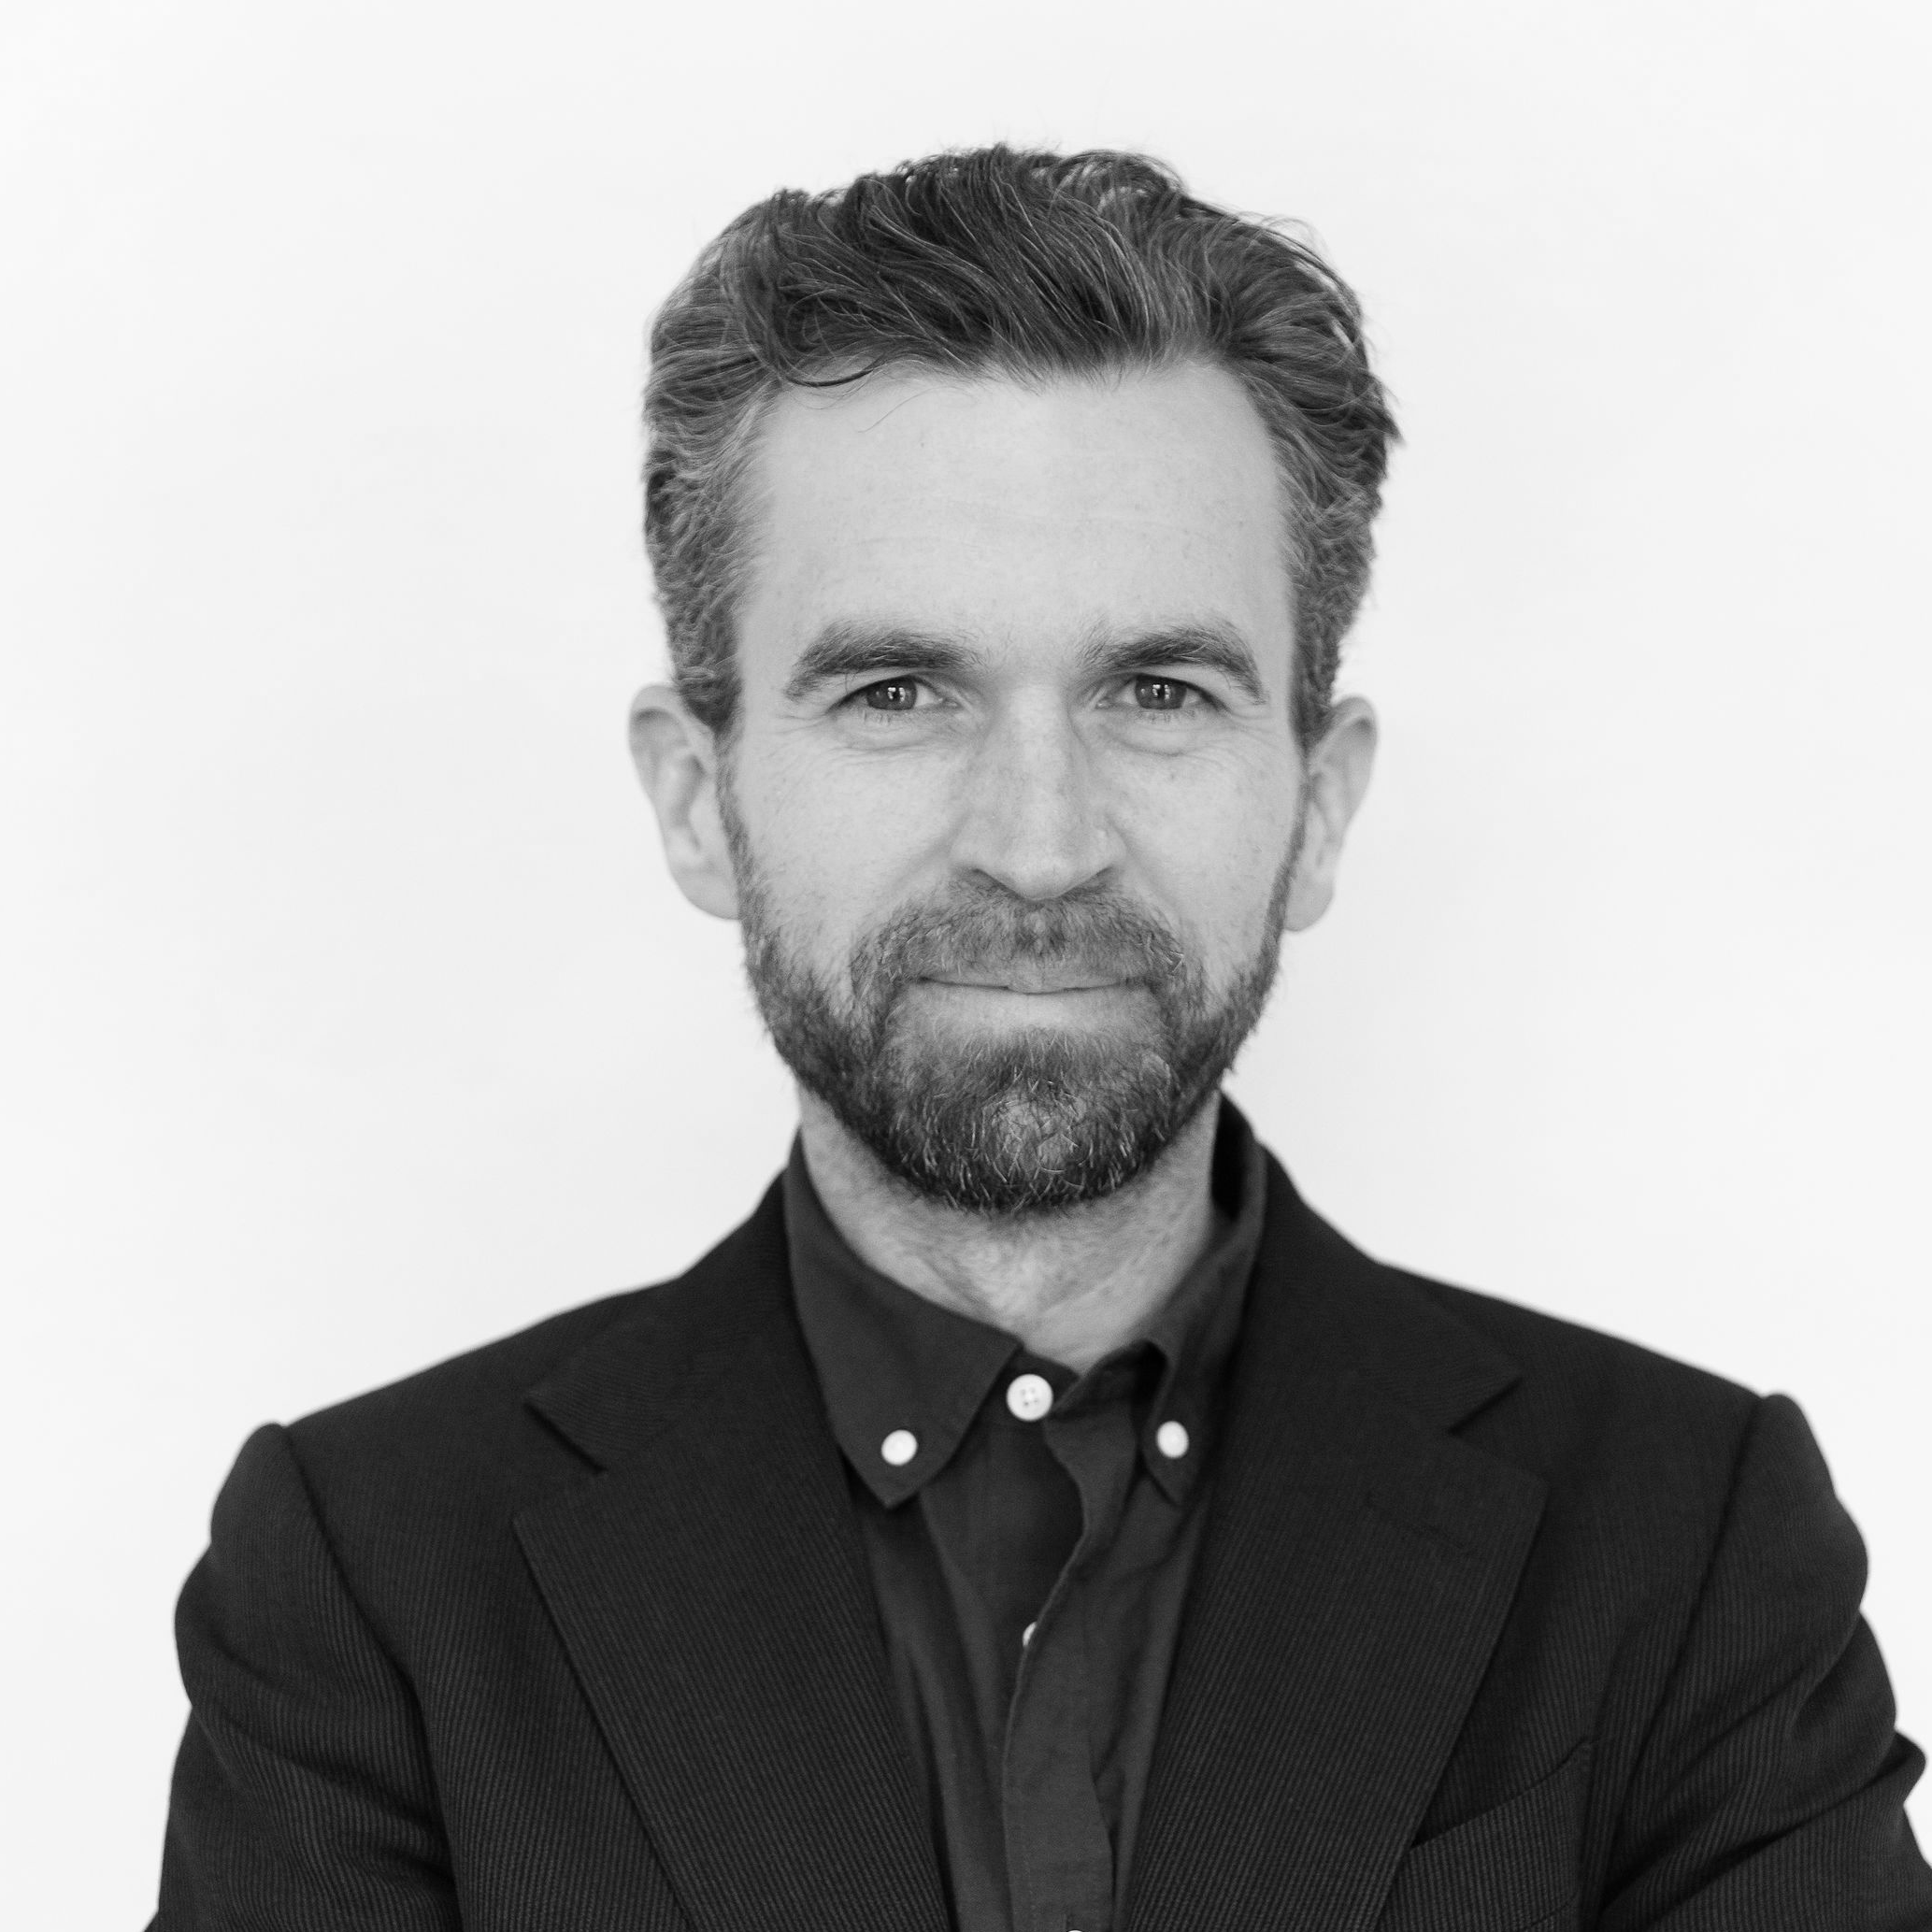 Jeremy O'Brien